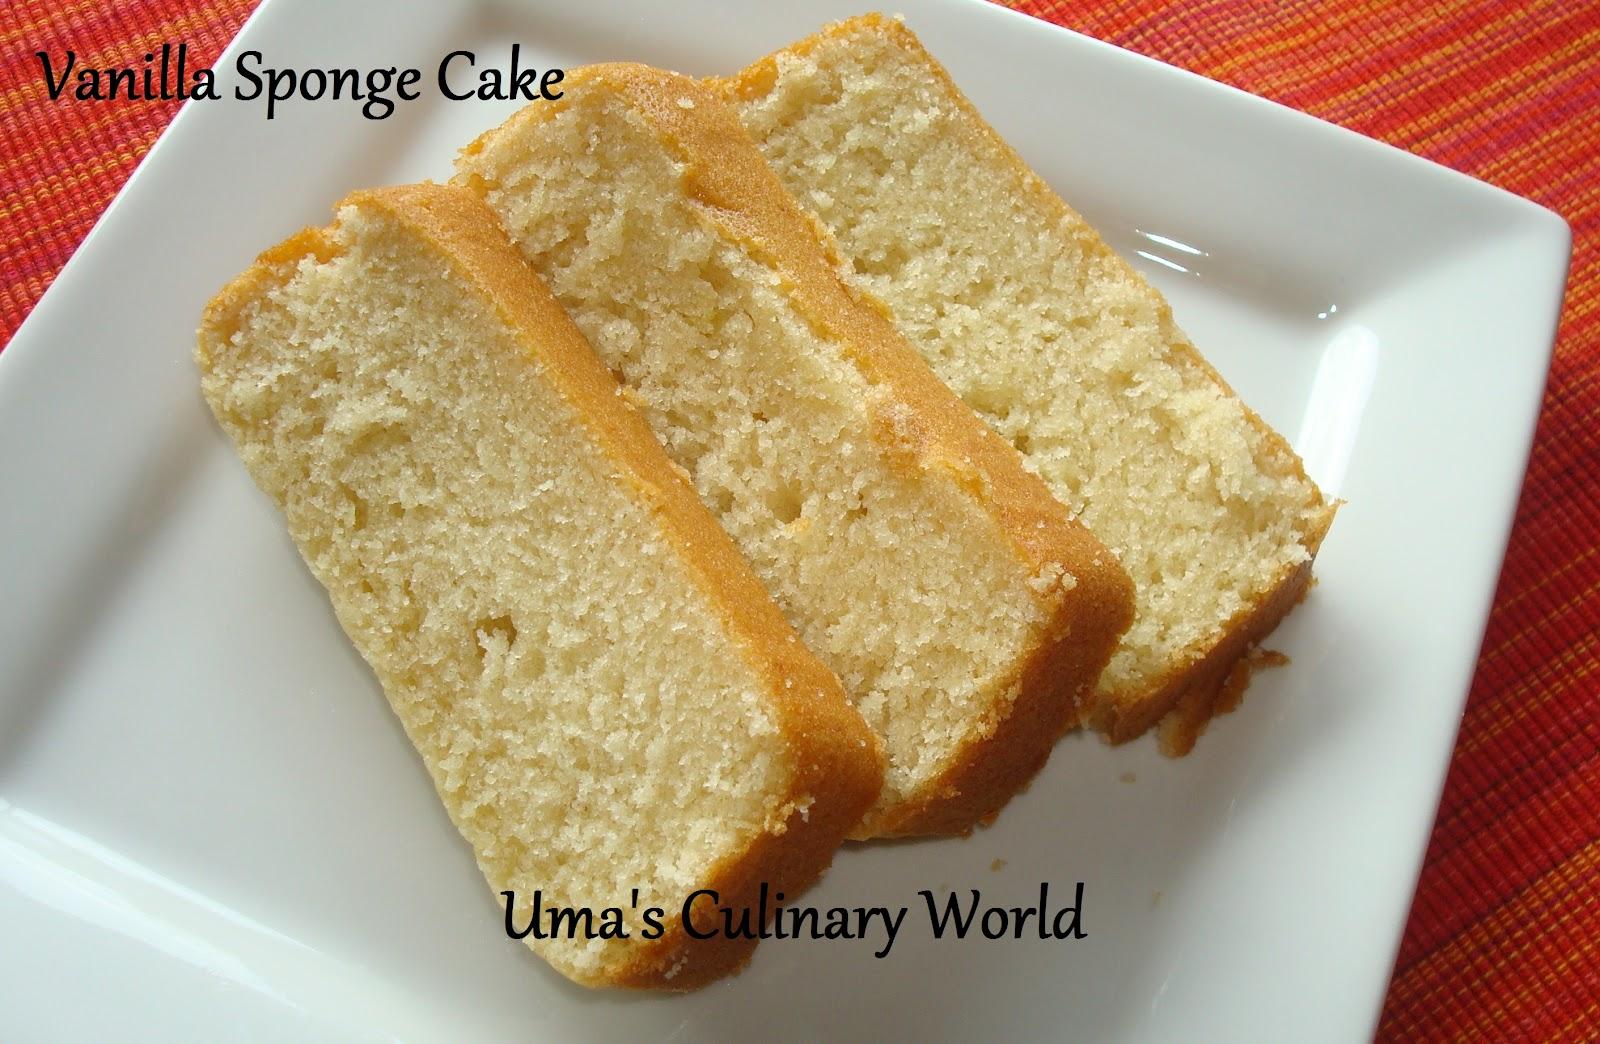 Cake At Home Eggless : Uma s Culinary World: Eggless Sour Cream Vanilla Sponge Cake